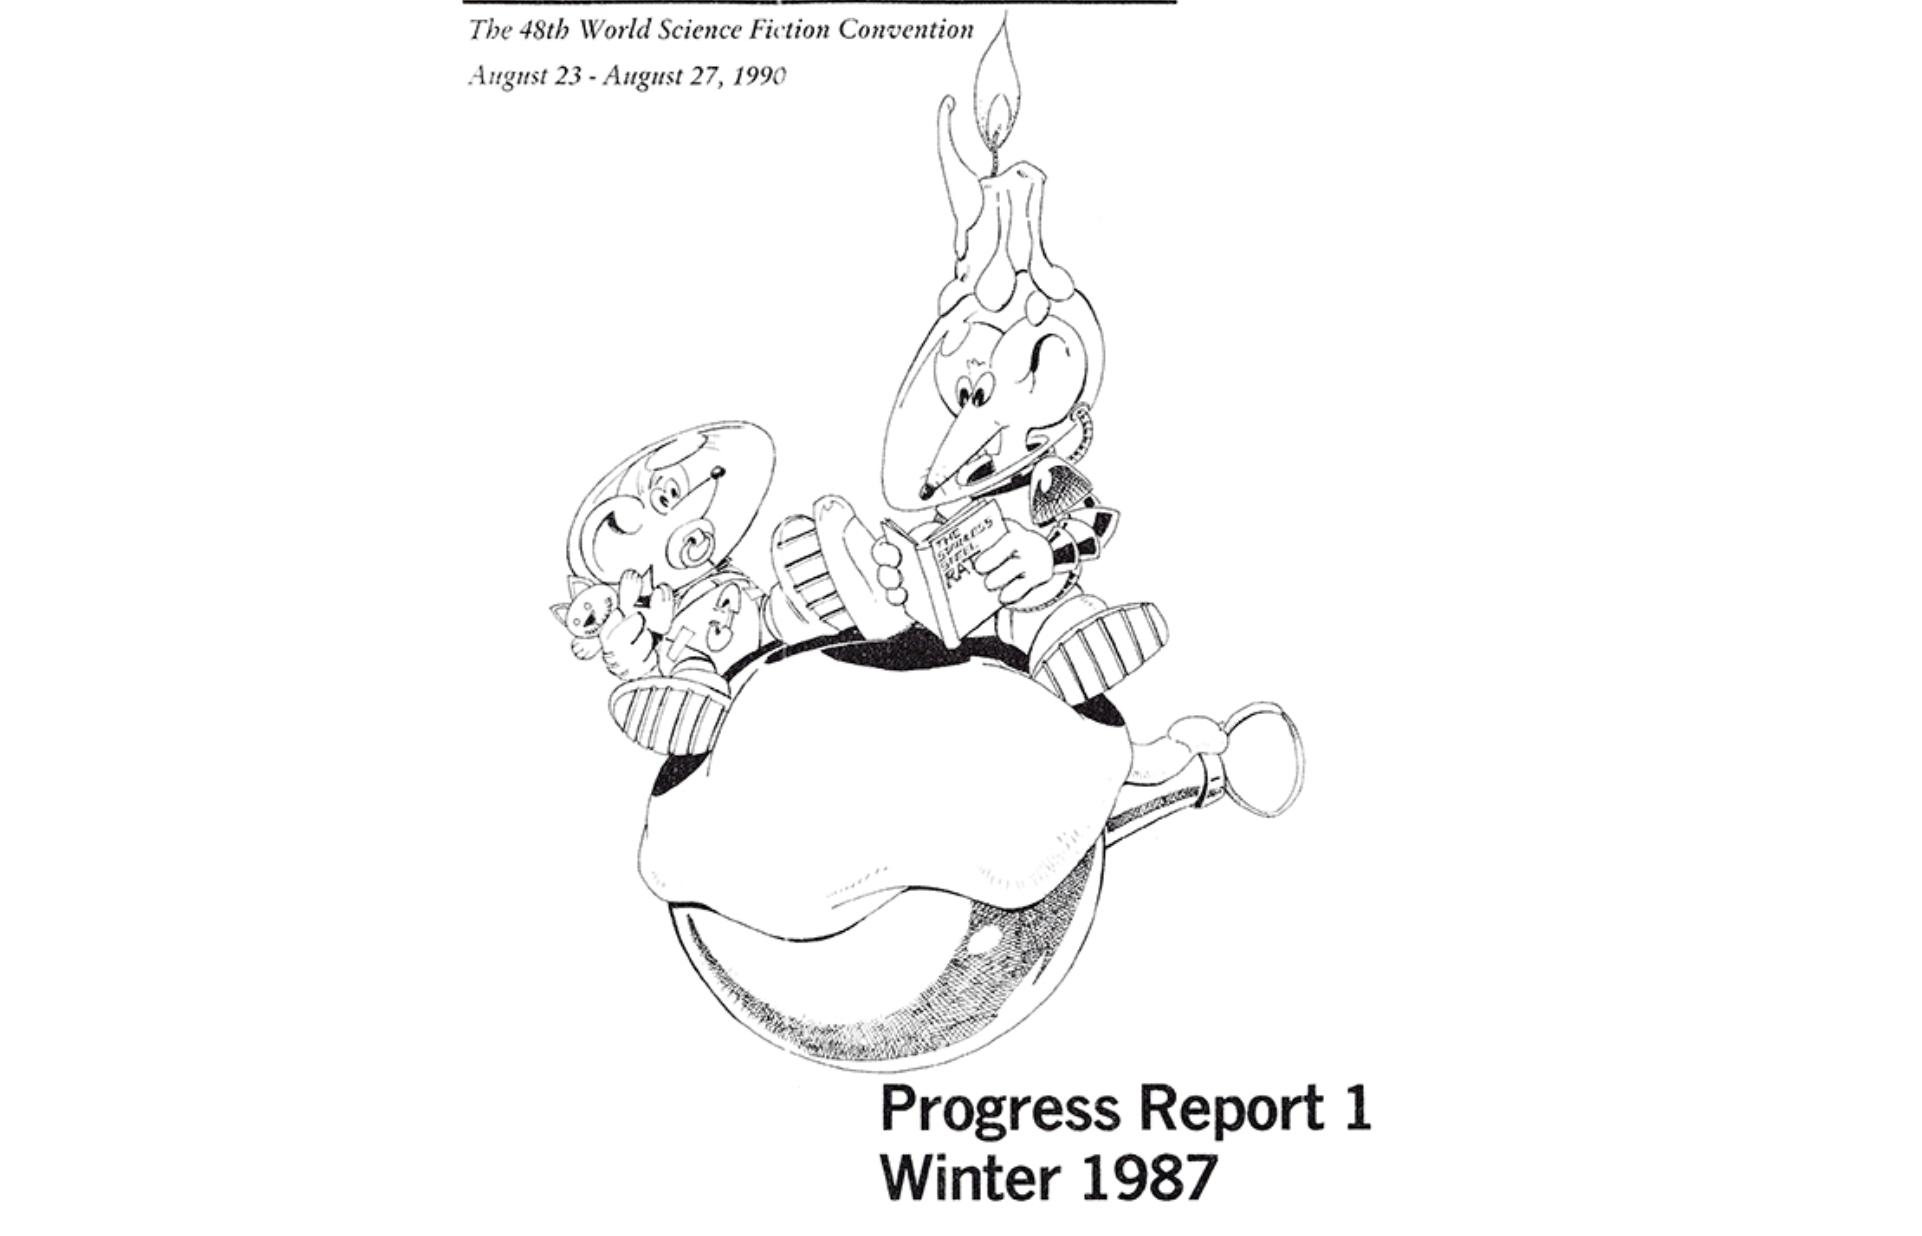 Progress Report 1 - Winter 1987